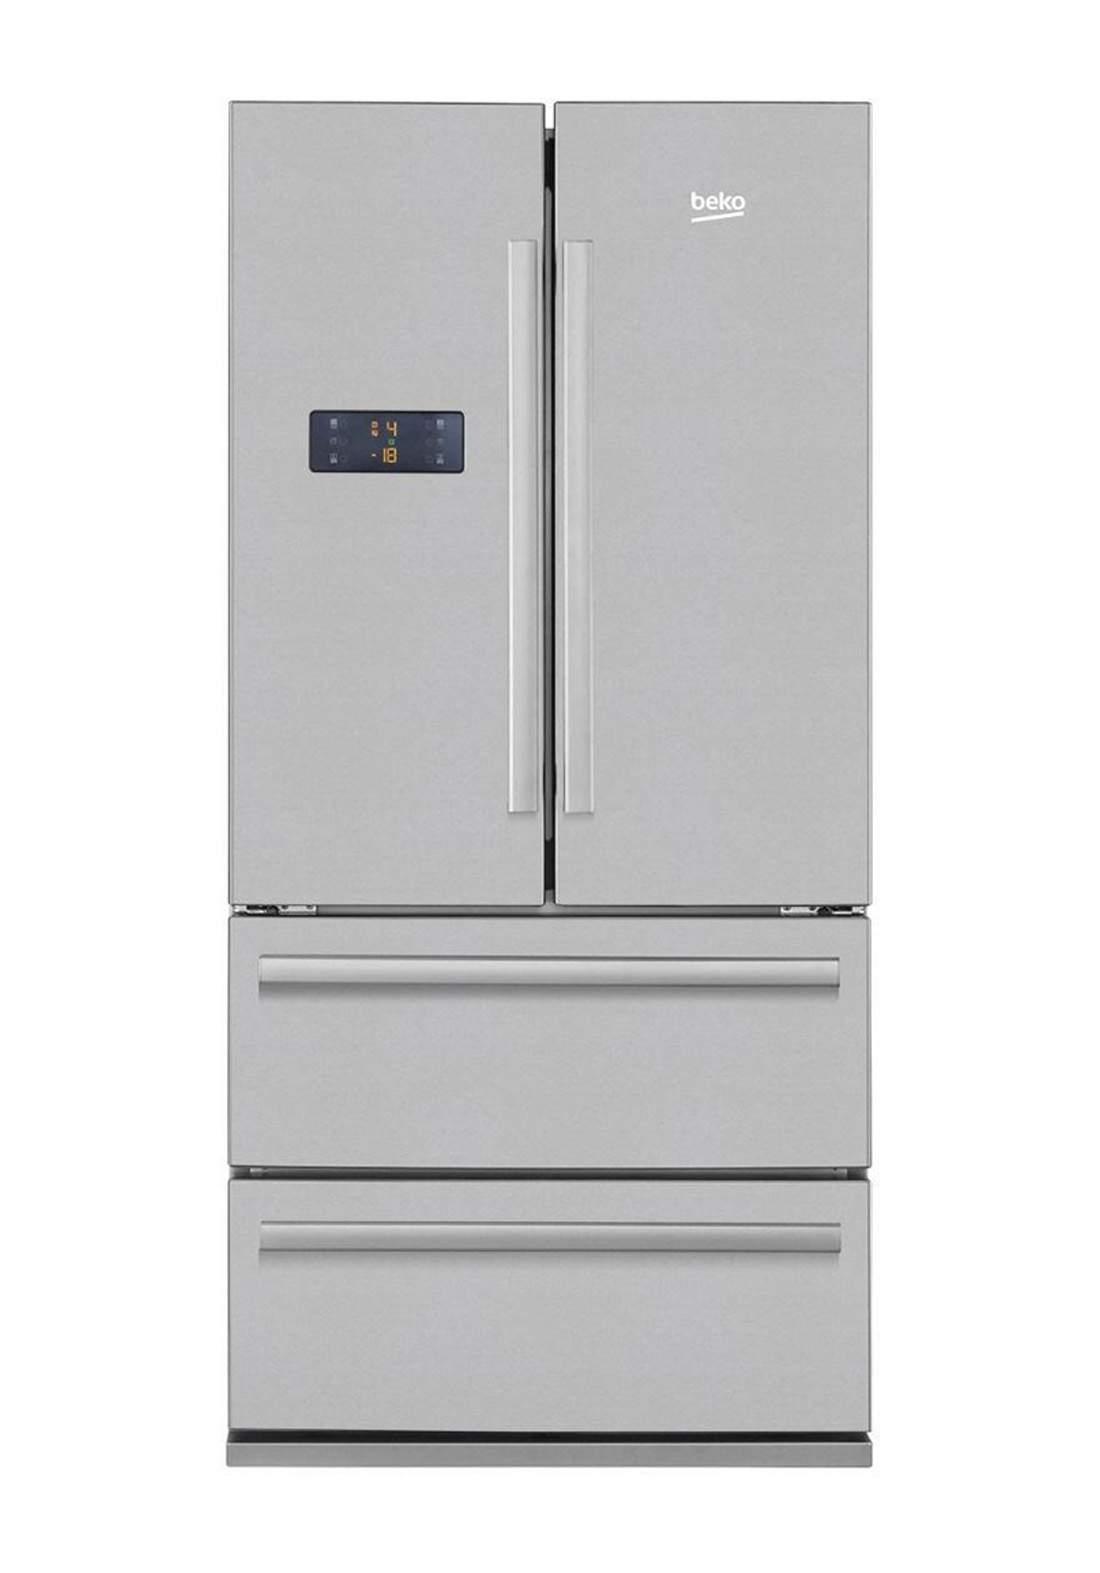 Beko GNE 60500 X Refrigerator 605 L - Gray